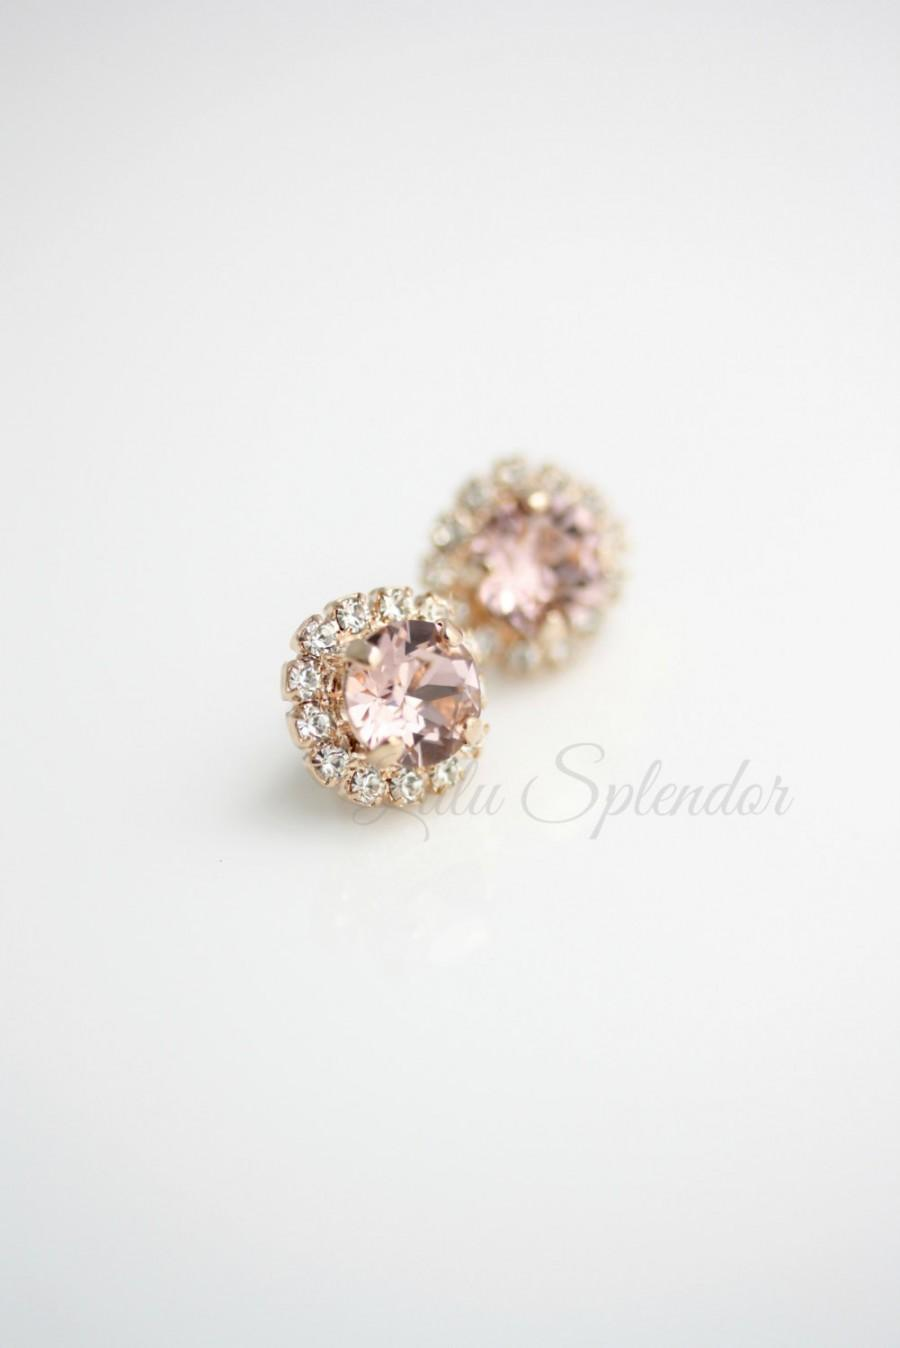 Mariage - Blush Crystal Earrings Rose Gold Stud Earrings Vintage Rose Crystal Bridal Earrings Soft Pink Bridesmaid Stud Earrings STUD